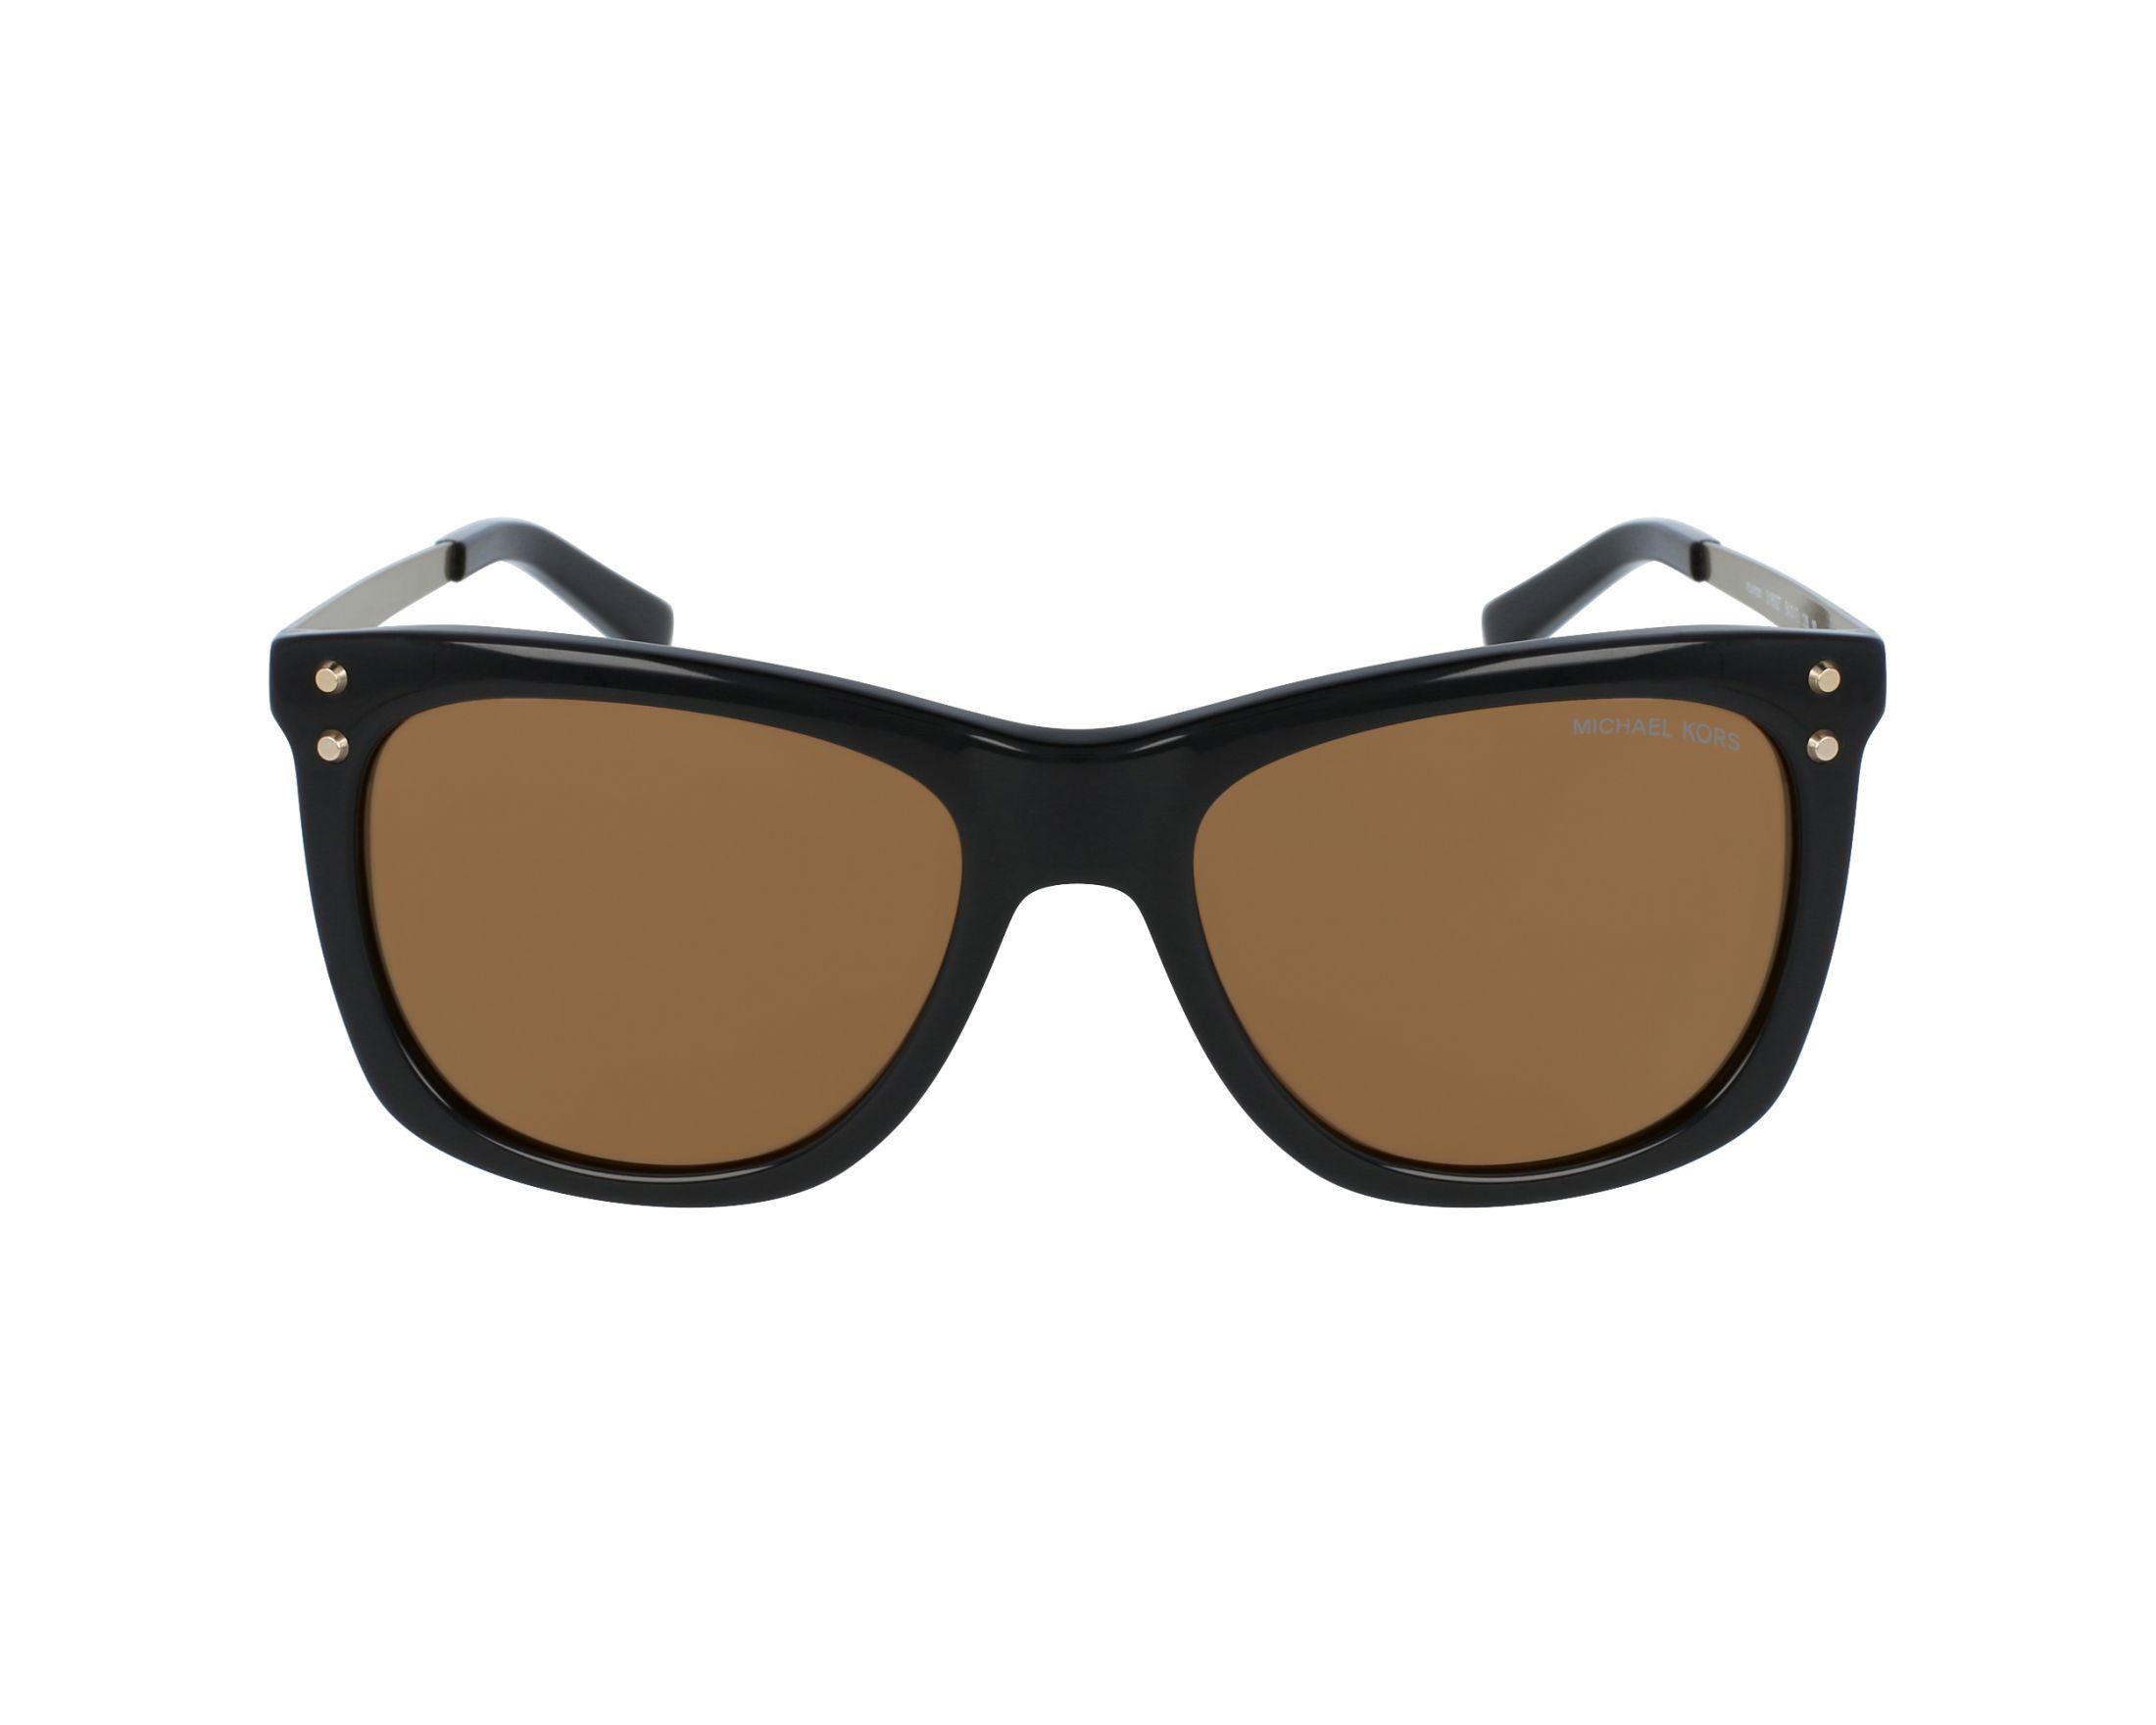 Womens Lex 31602T Sunglasses, Black/Goldmirrorpolarized, 54 Michael Kors